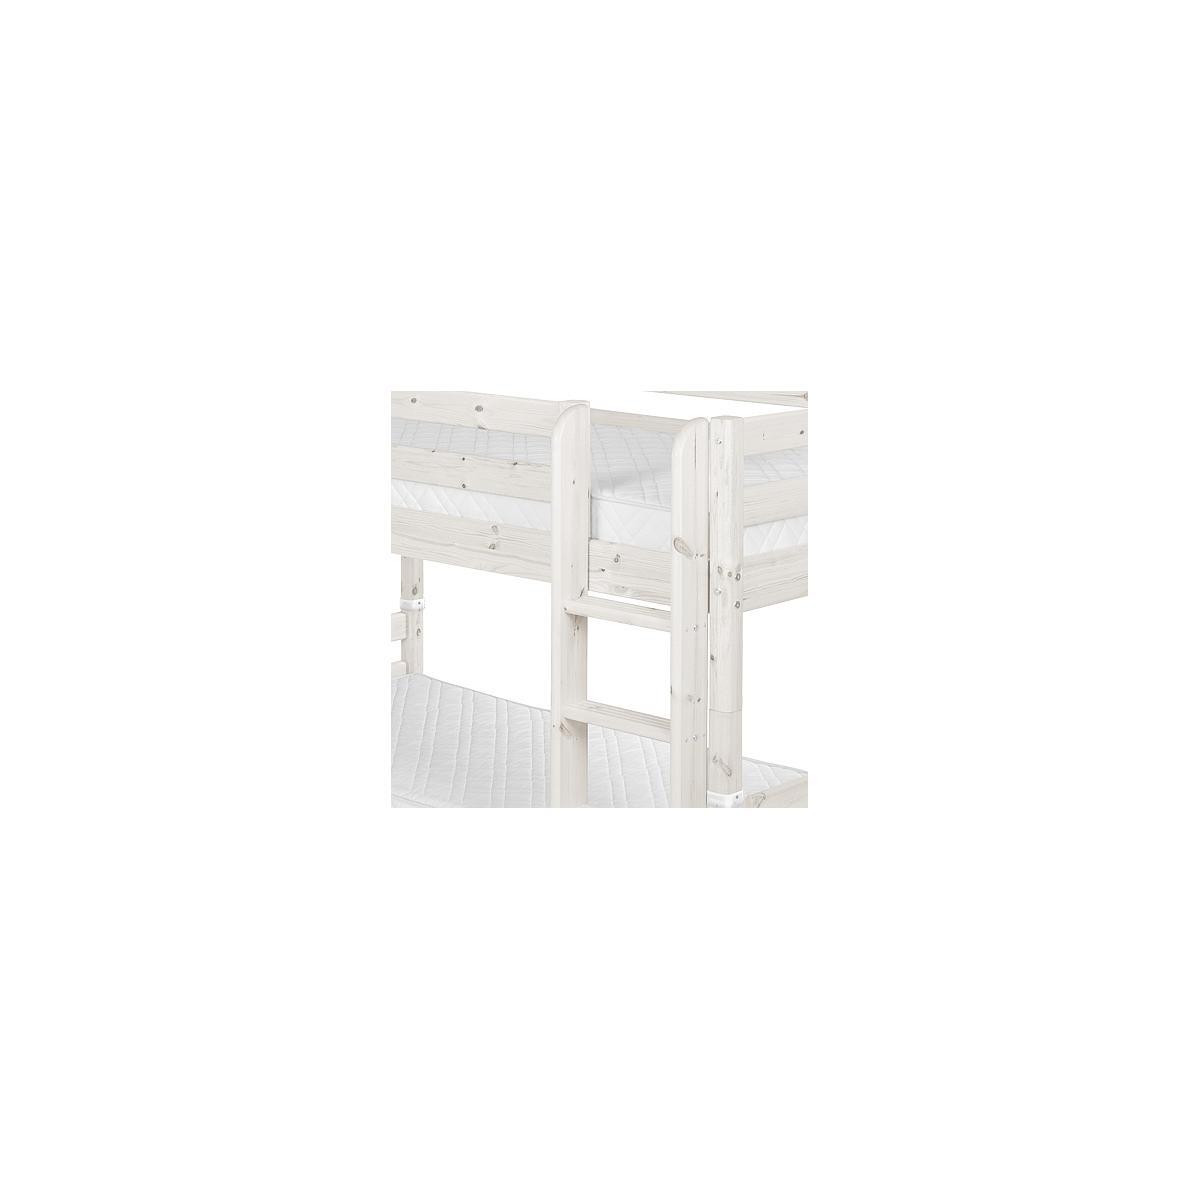 Litera 90x200 CLASSIC Flexa escalera inclinada blanco cal